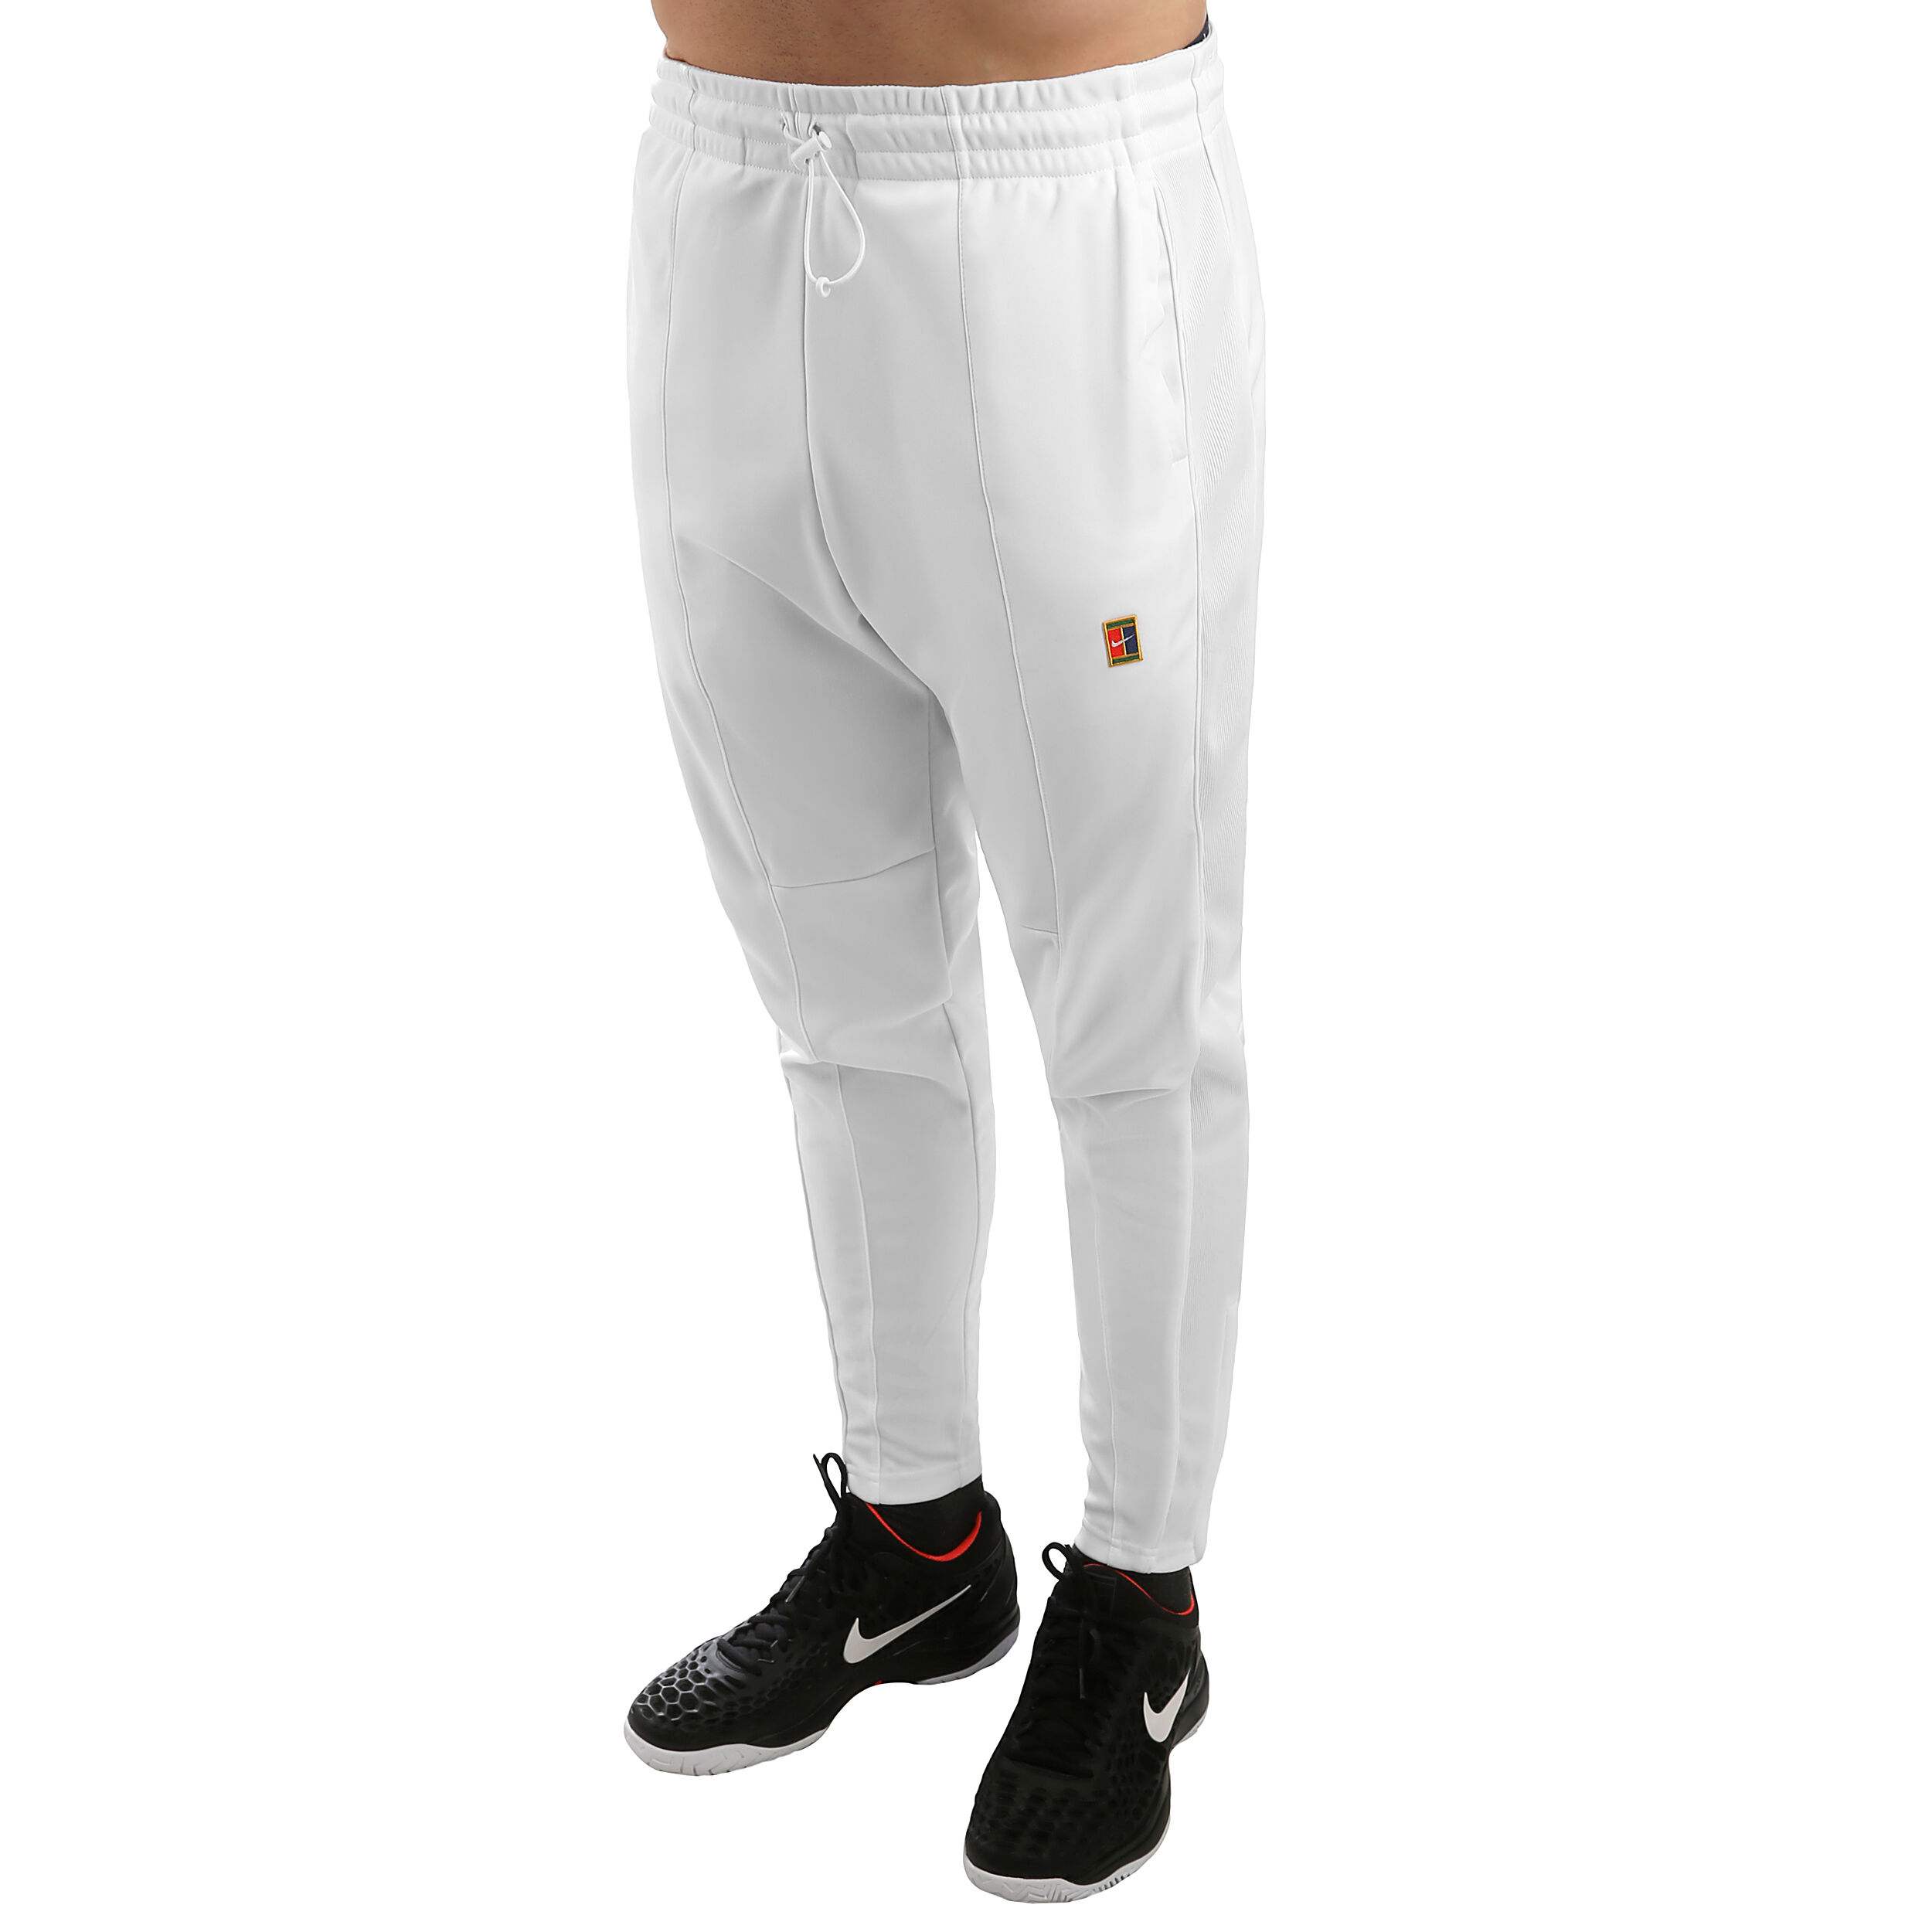 Nike Court Essential Trainingsbroek Heren Wit, Rood online